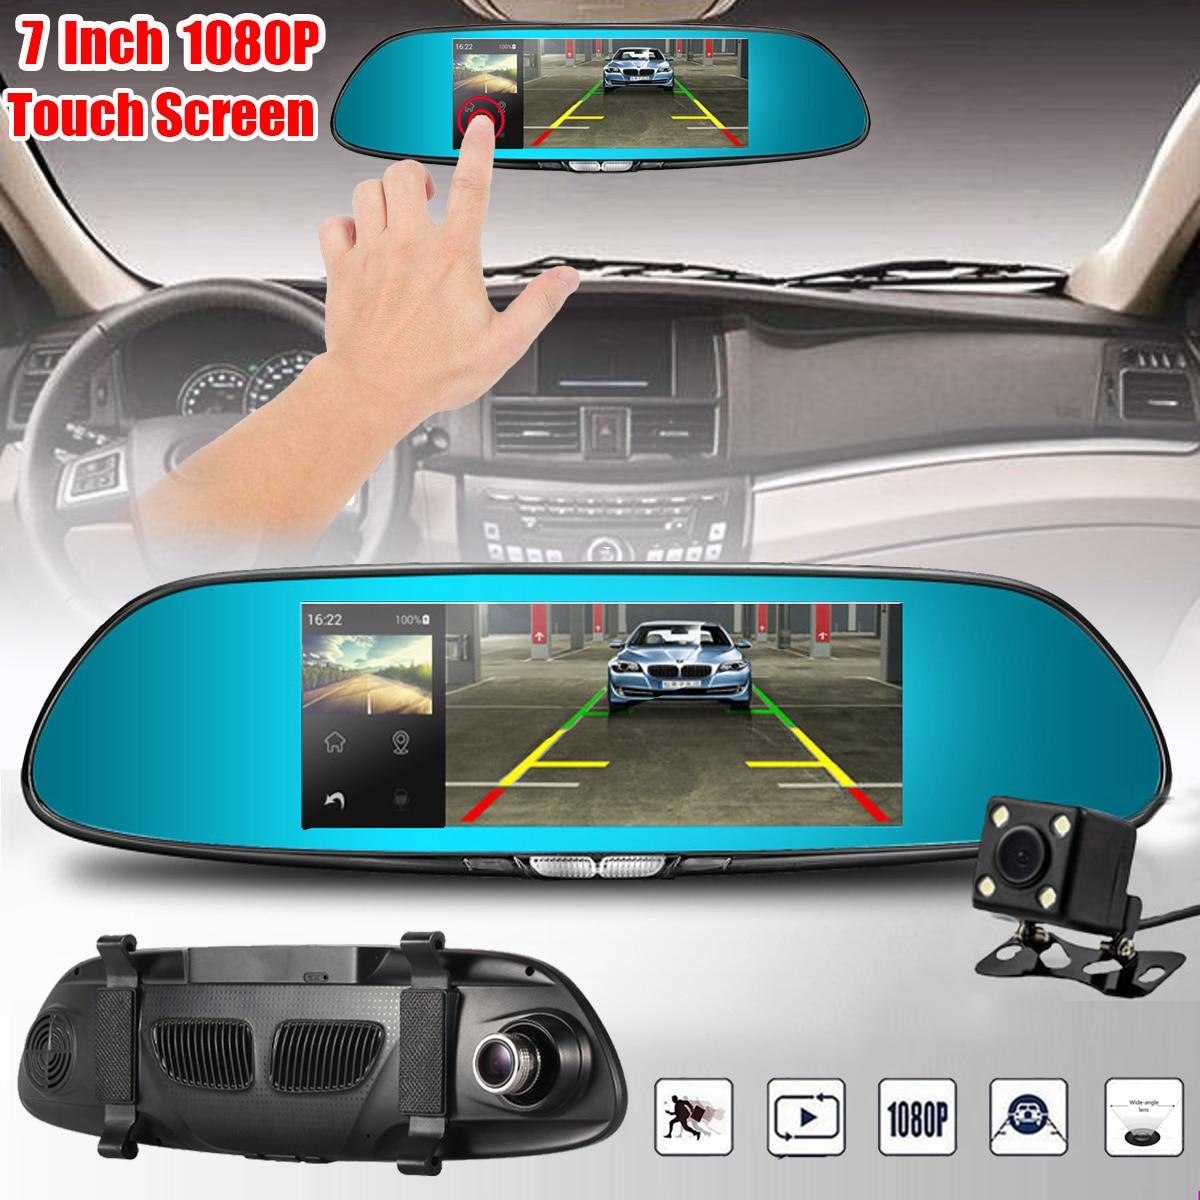 цены FHD 1080P 7 Inch Dual Lens Rear View Mirror Dash Reversing Camera DVR Car 170 Degree Touchable Car Camera Recorder Dash Cam